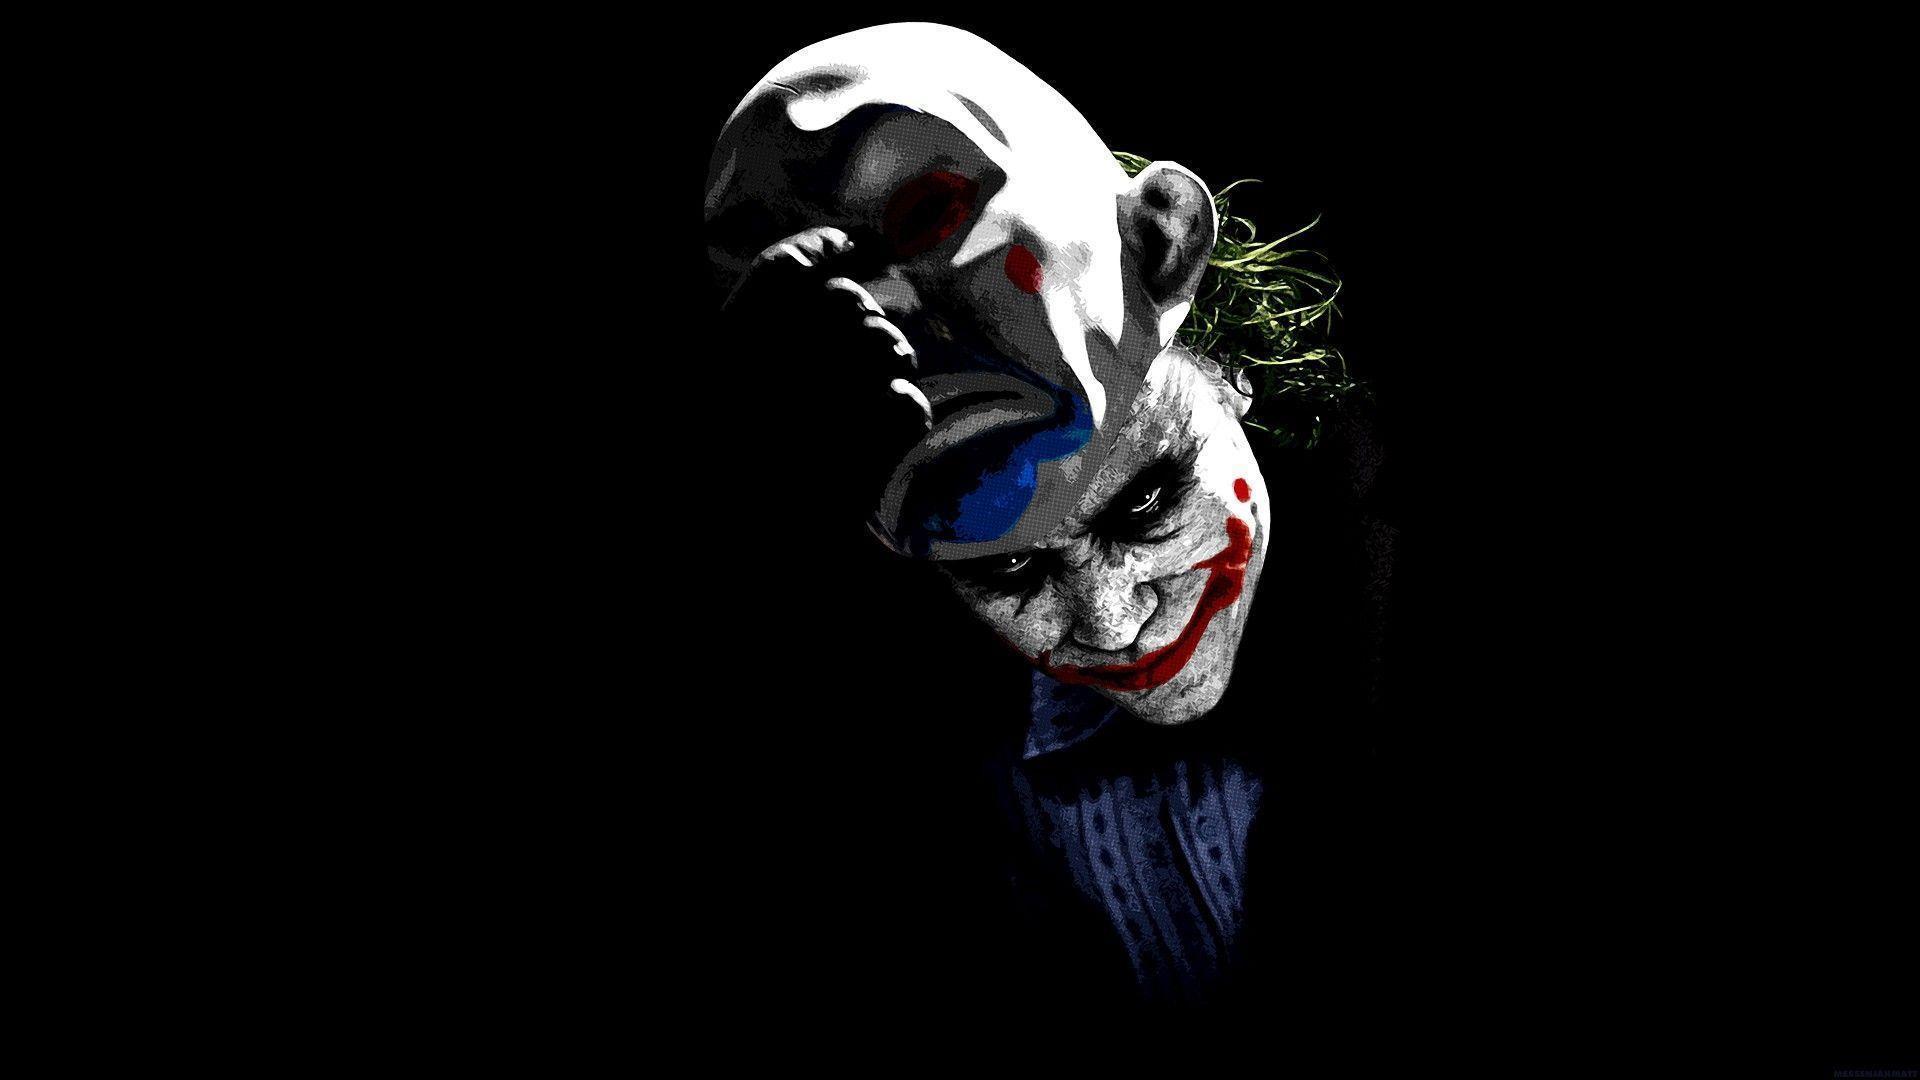 Evil Clown Wallpapers